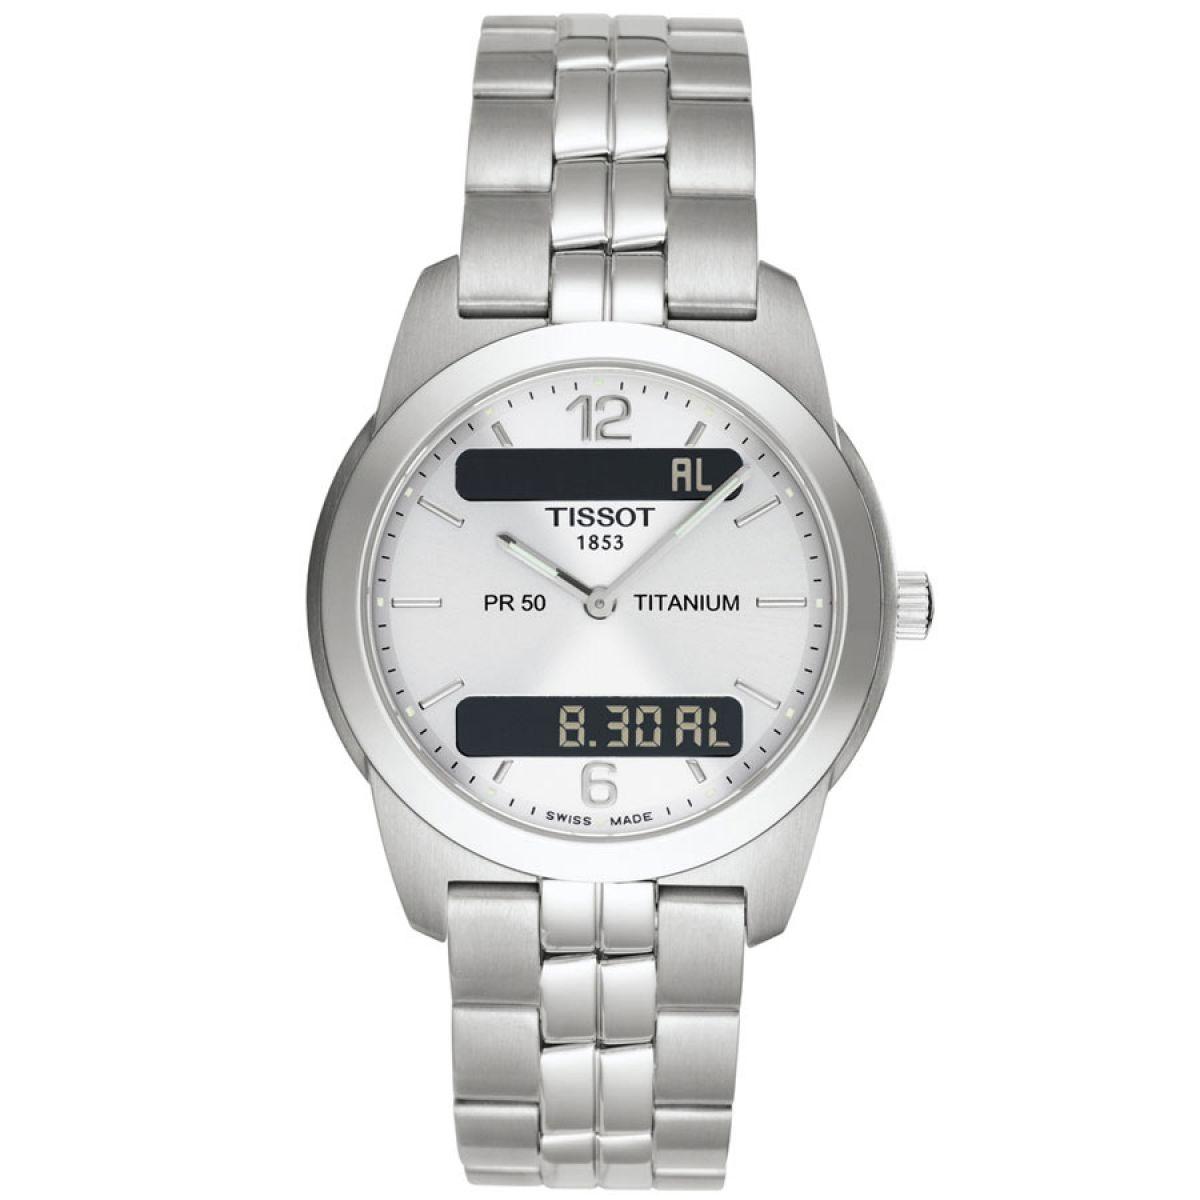 gents tissot pr50 seven chronograph watch t34748732 watchshop com rh watchshop com Tissot T-Sport Titanium Tissot T-Sport Titanium